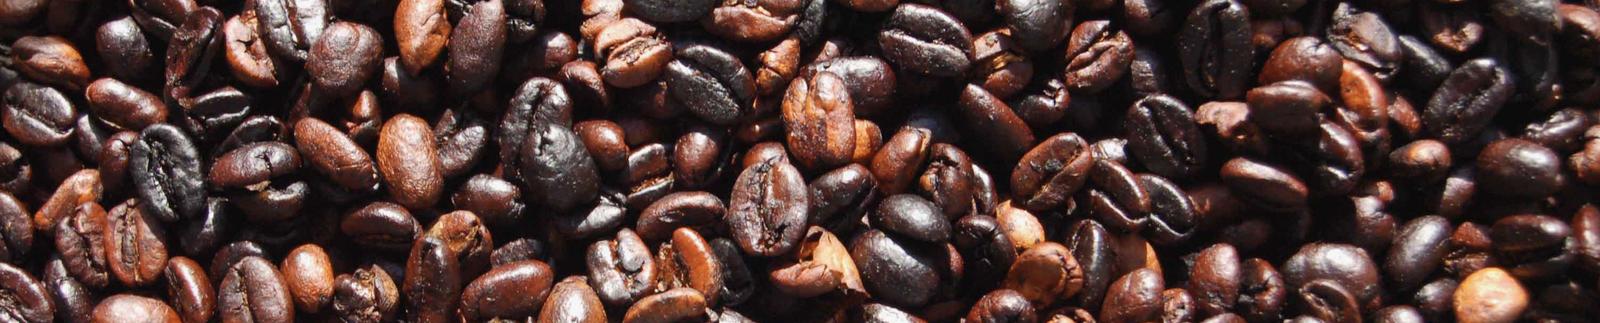 Manaresi Caffe Espresso Coffee